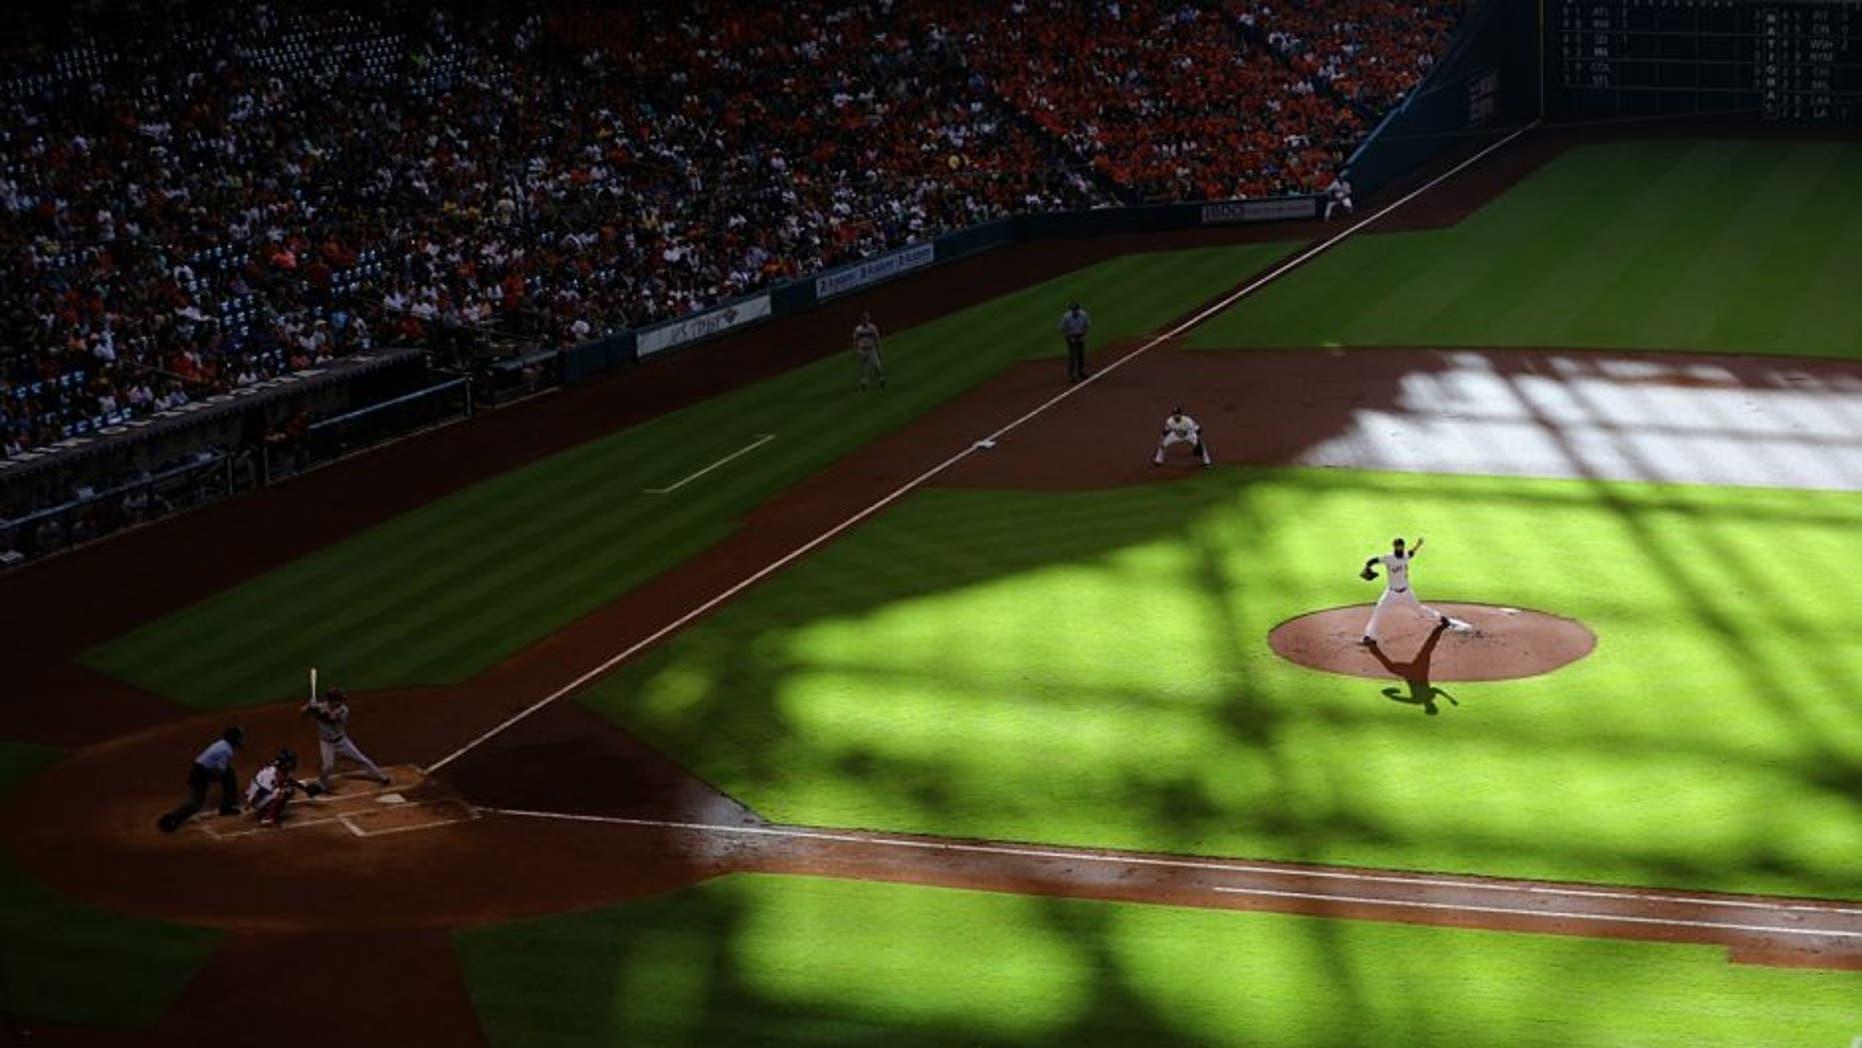 D-backs' bats go dark as win streak snapped | Fox News